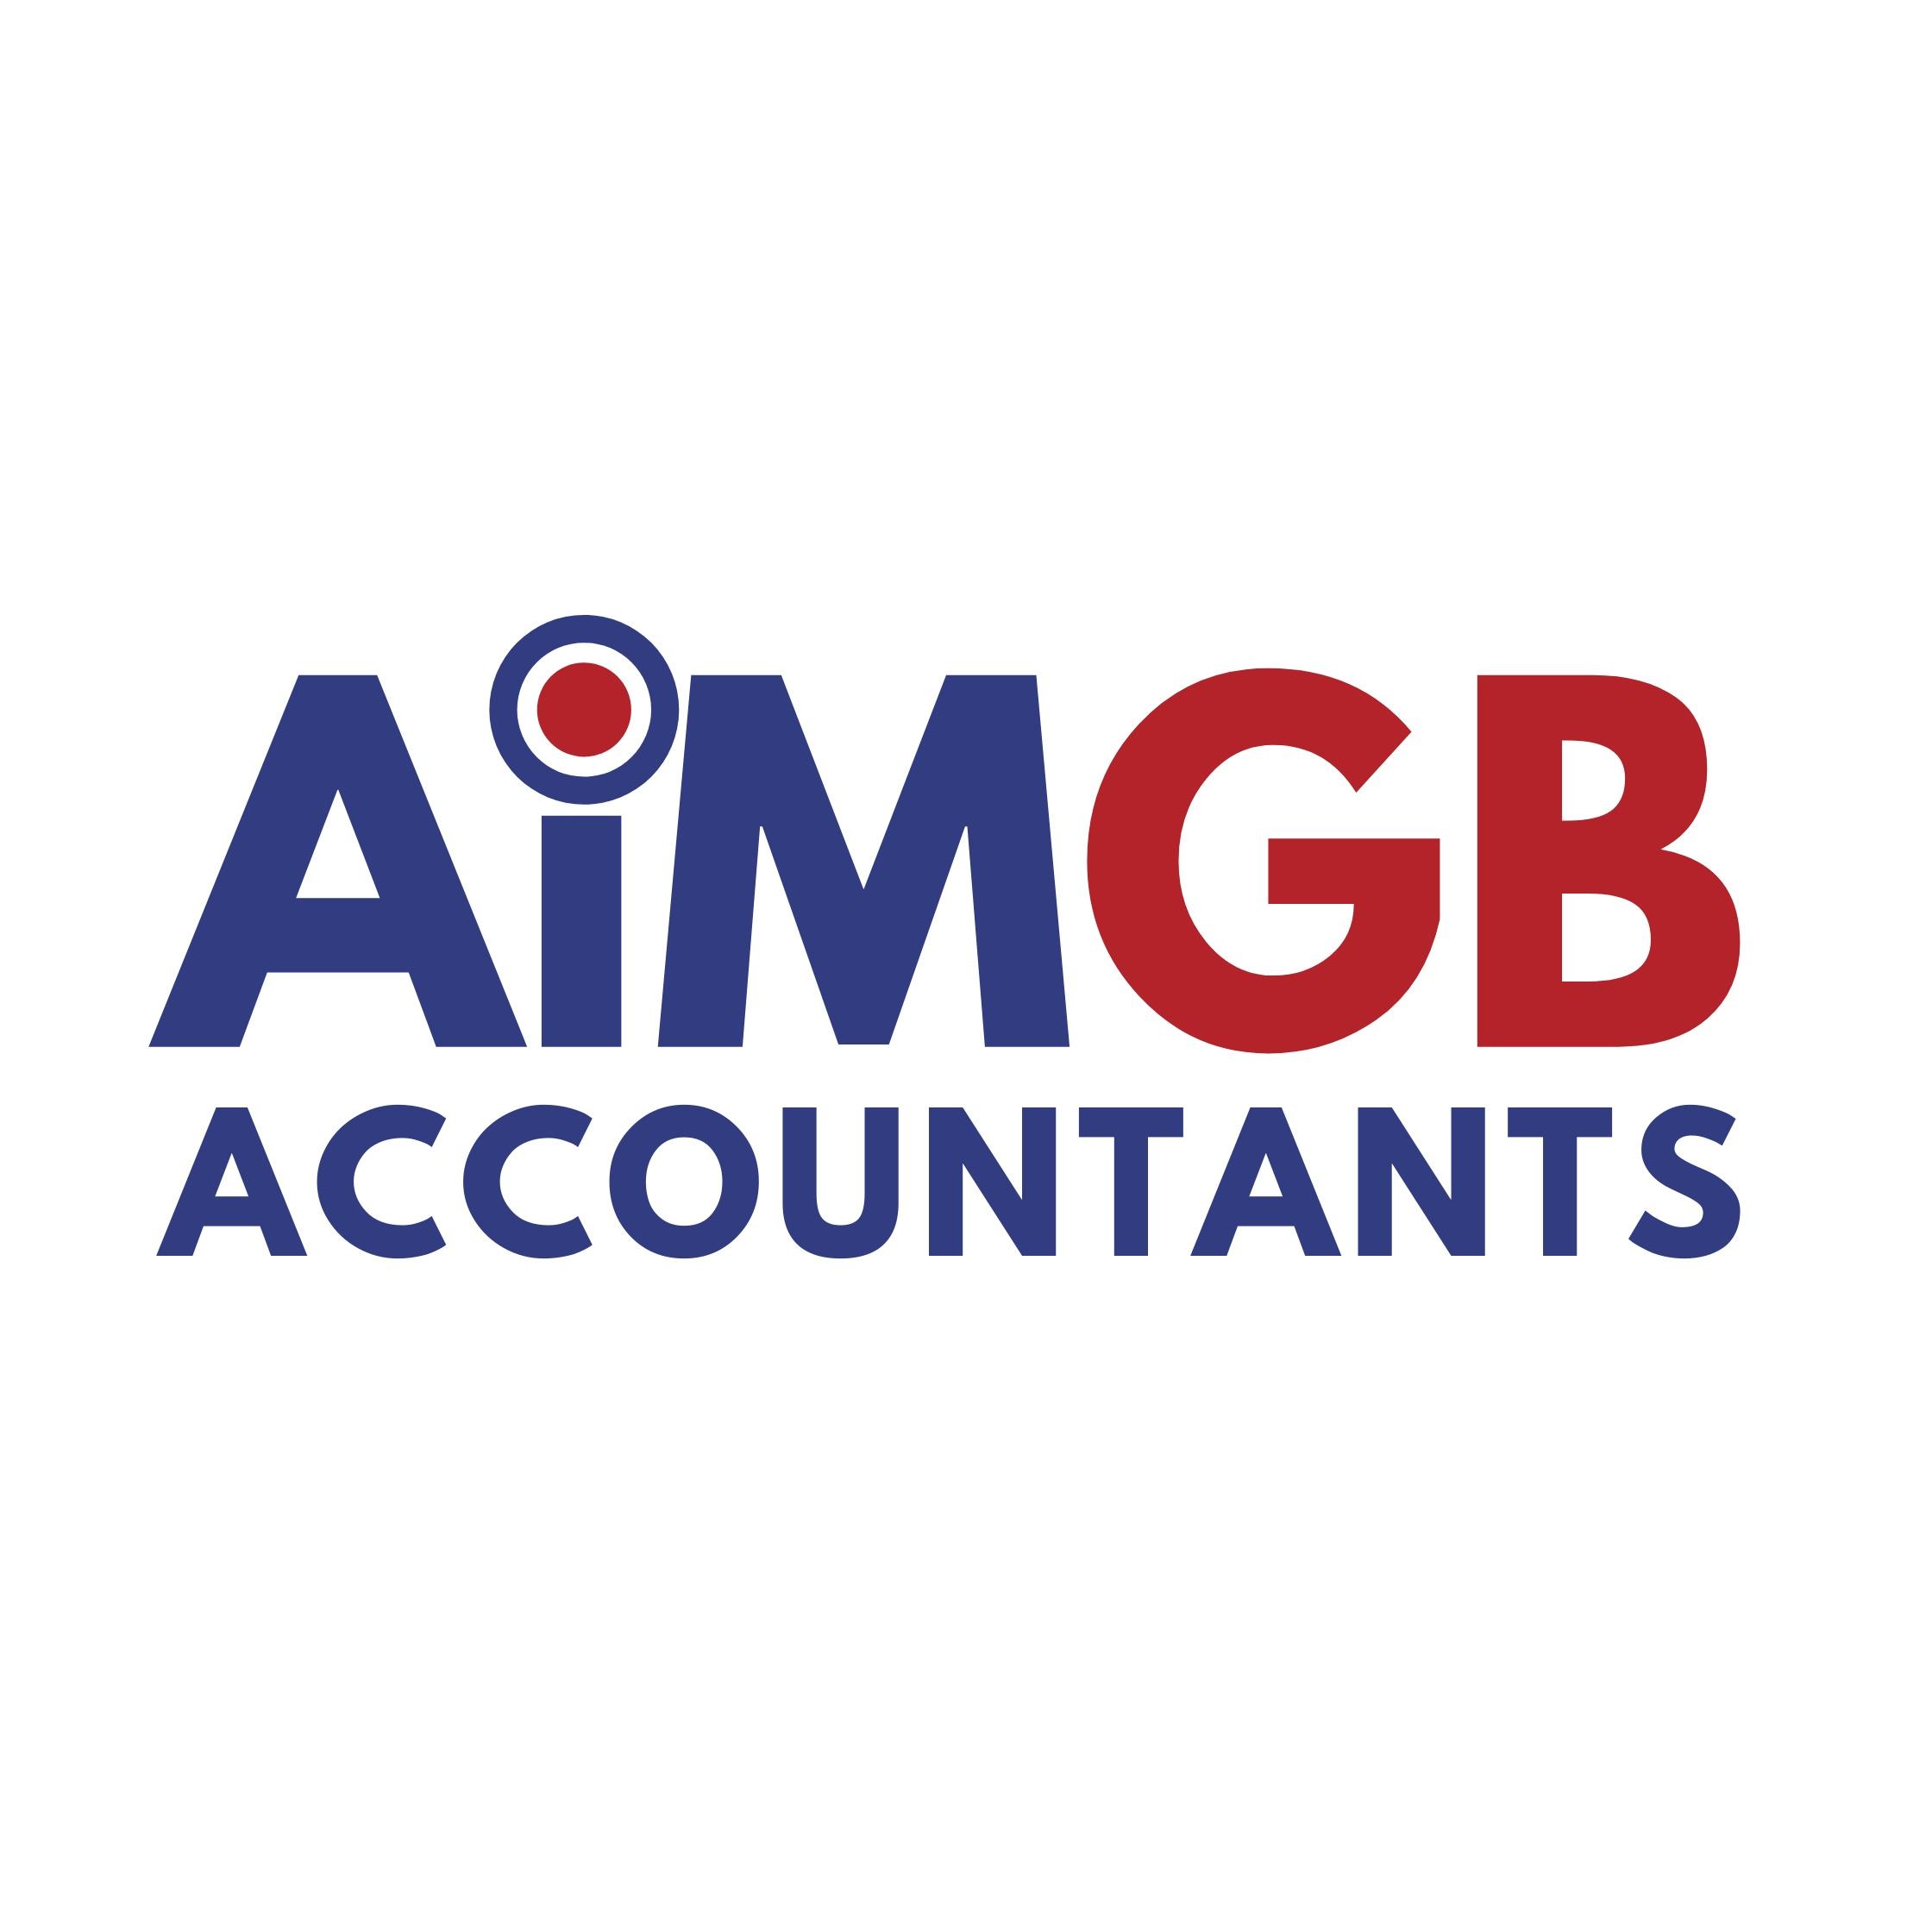 AiMGB Accountants